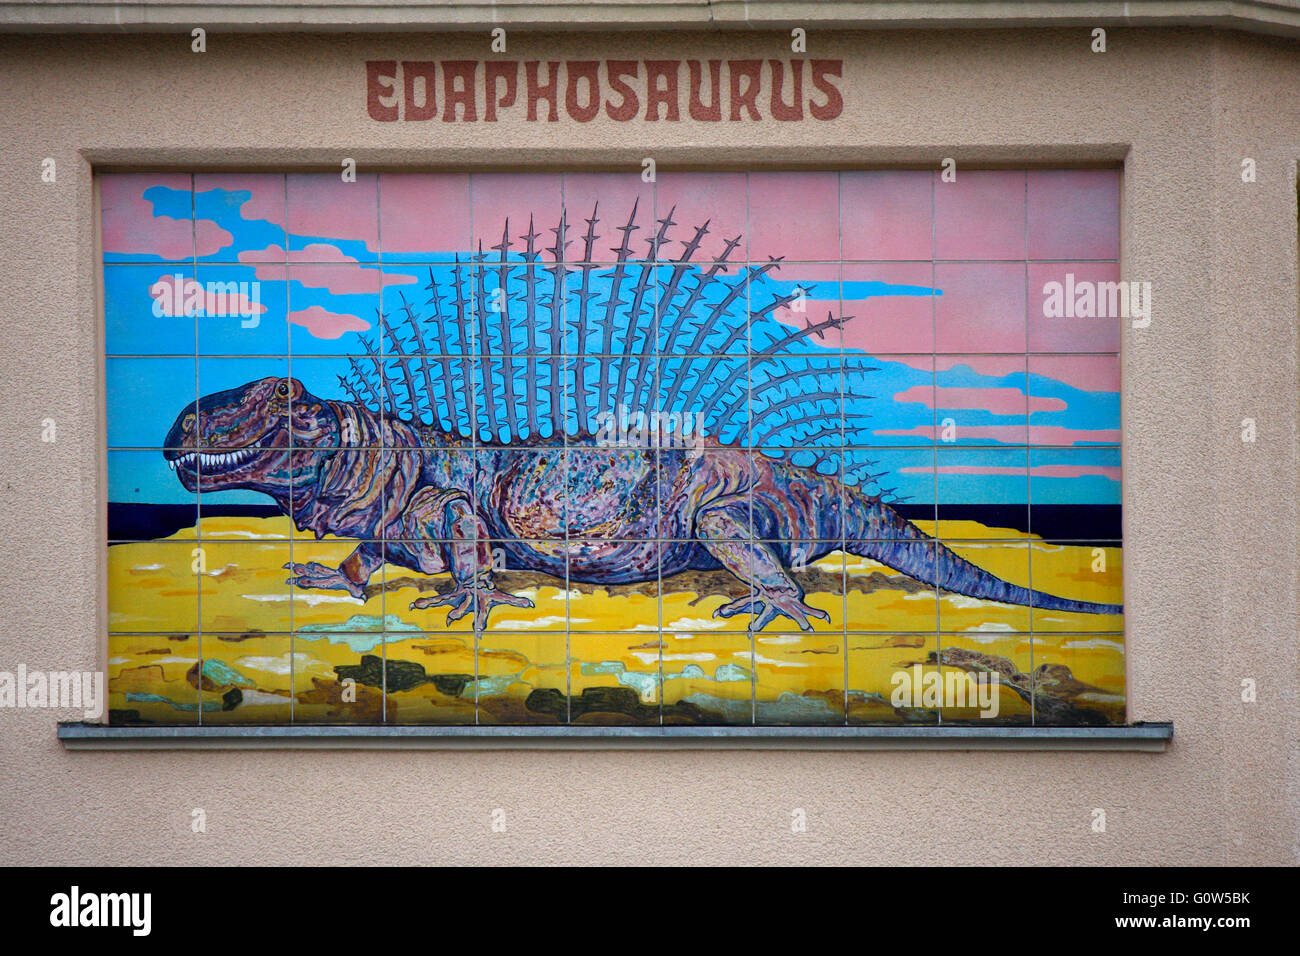 Darstellung eines Edaphosaurus, Berliner Zoo, Berlin. - Stock Image